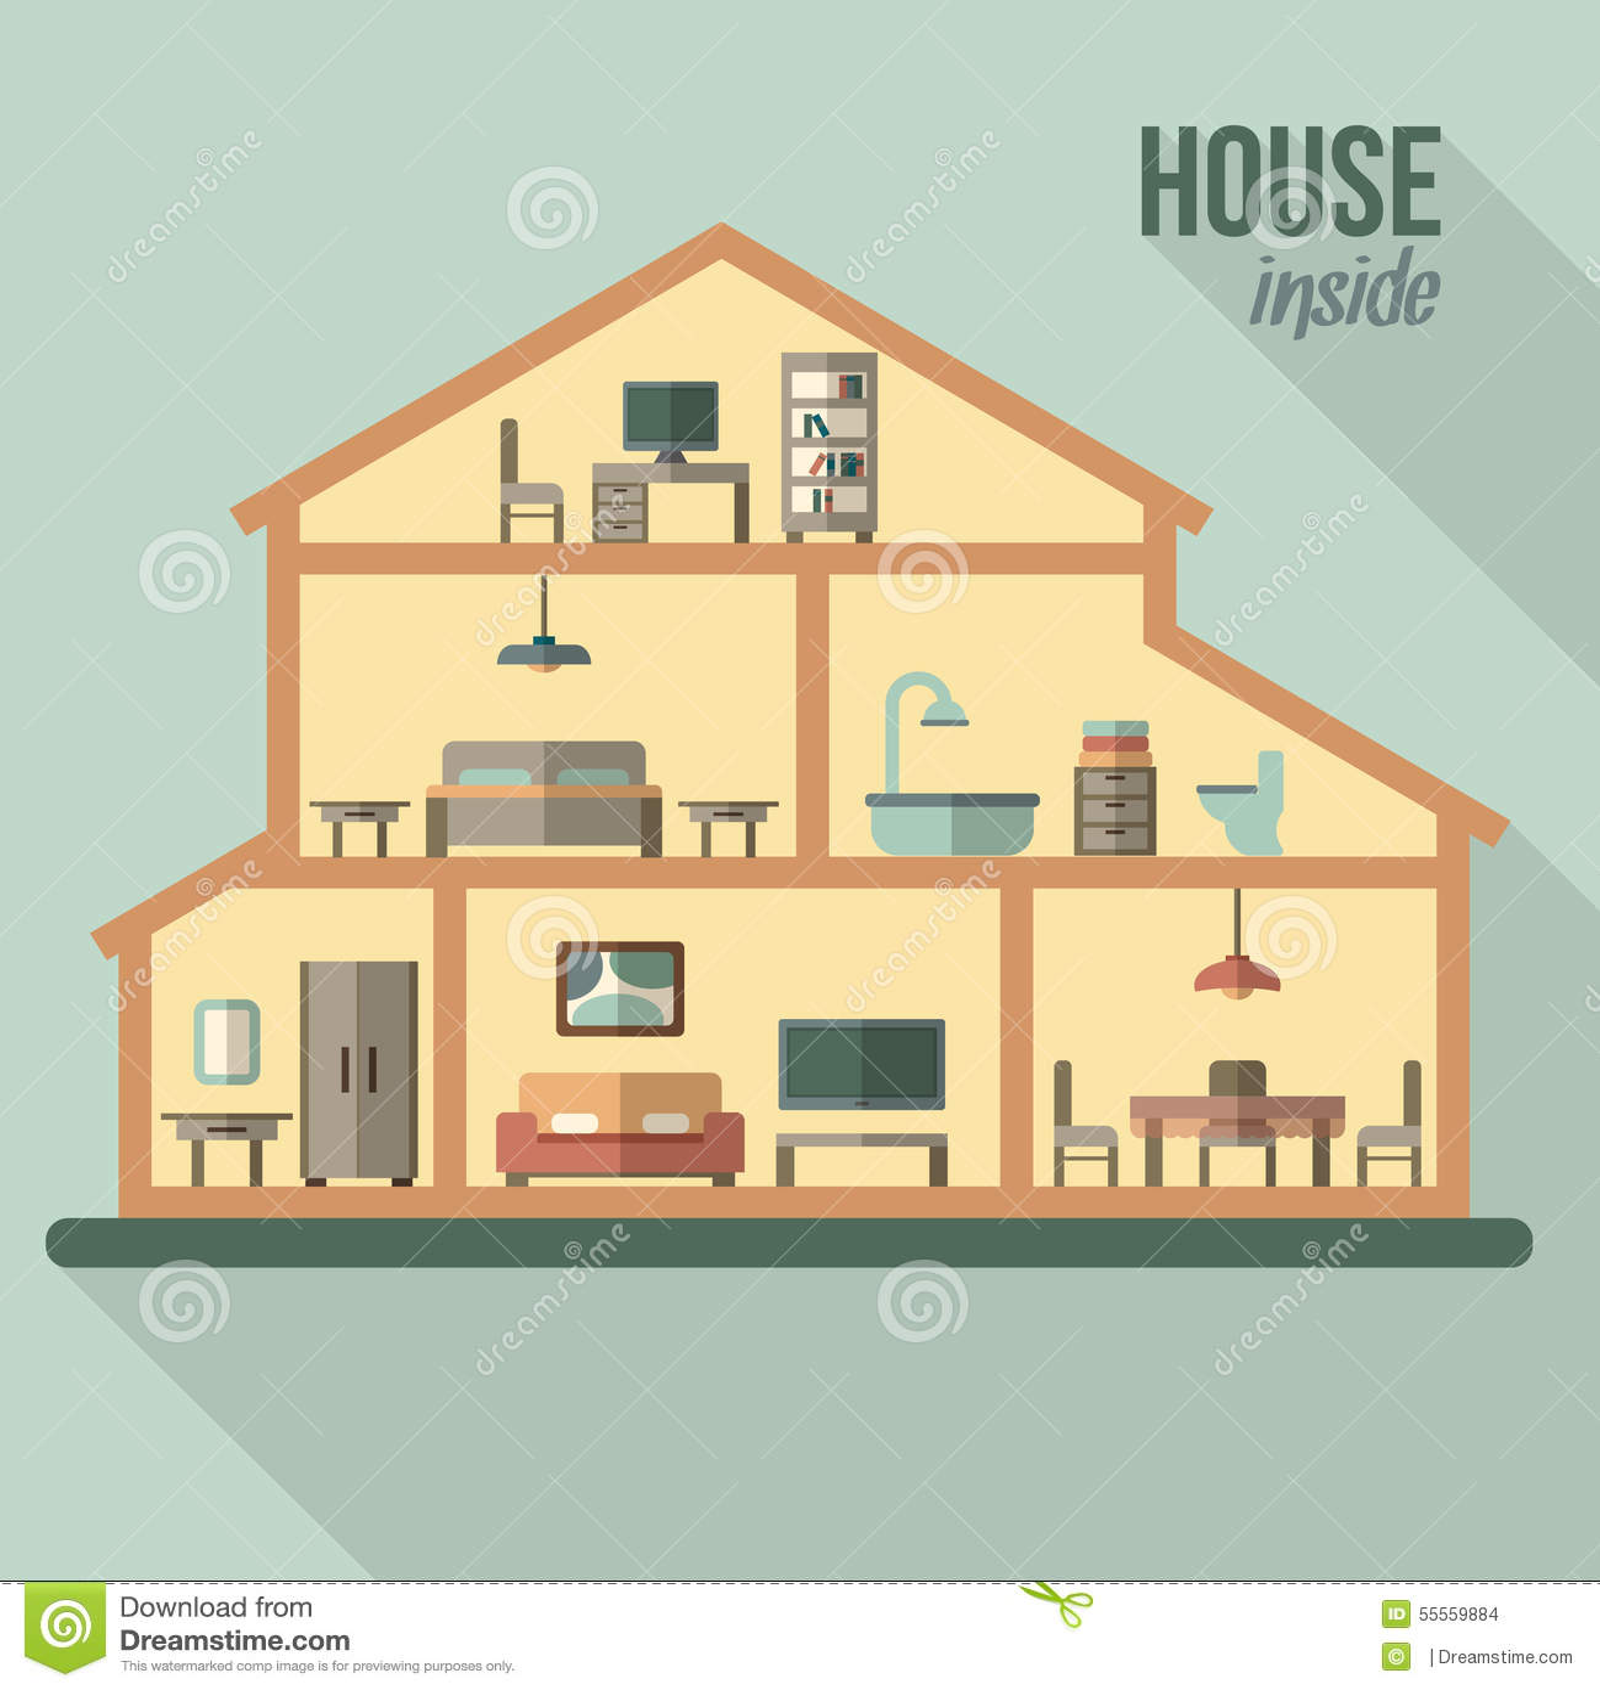 House in cut detailed modern house interior stock vector - Plan de coupe maison ...